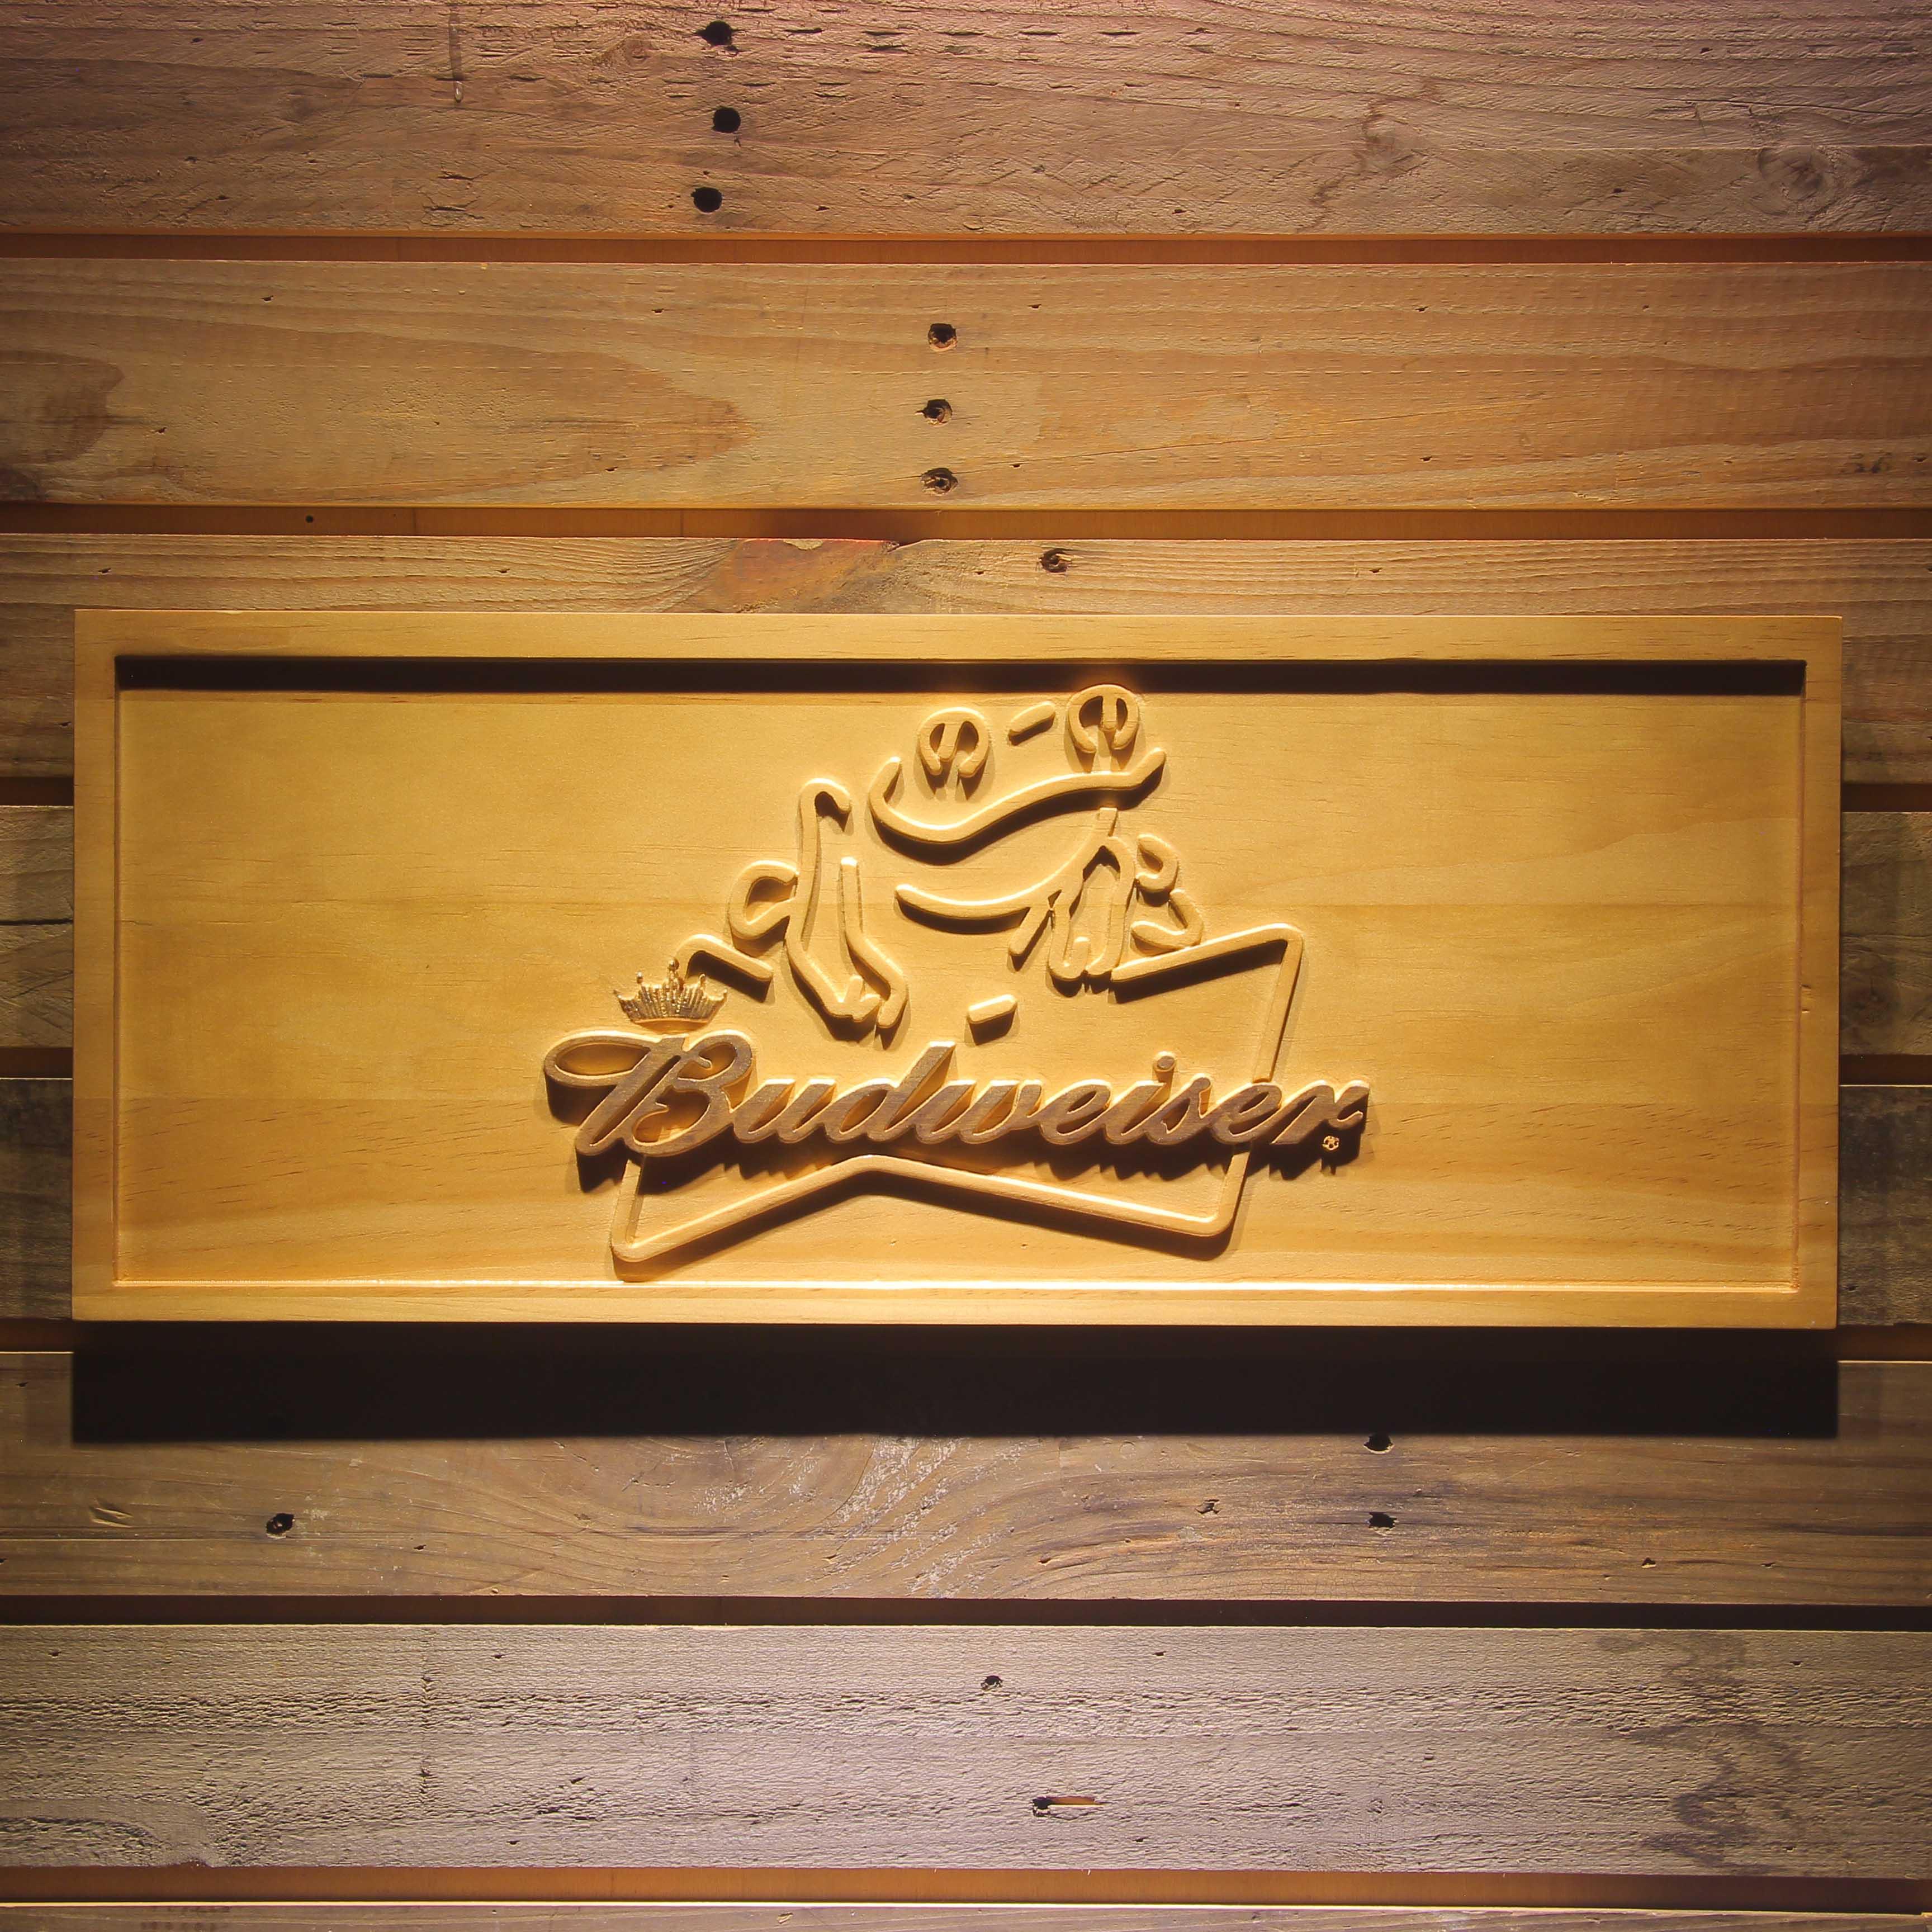 Budweiser Frog Beer 3D Wooden Sign